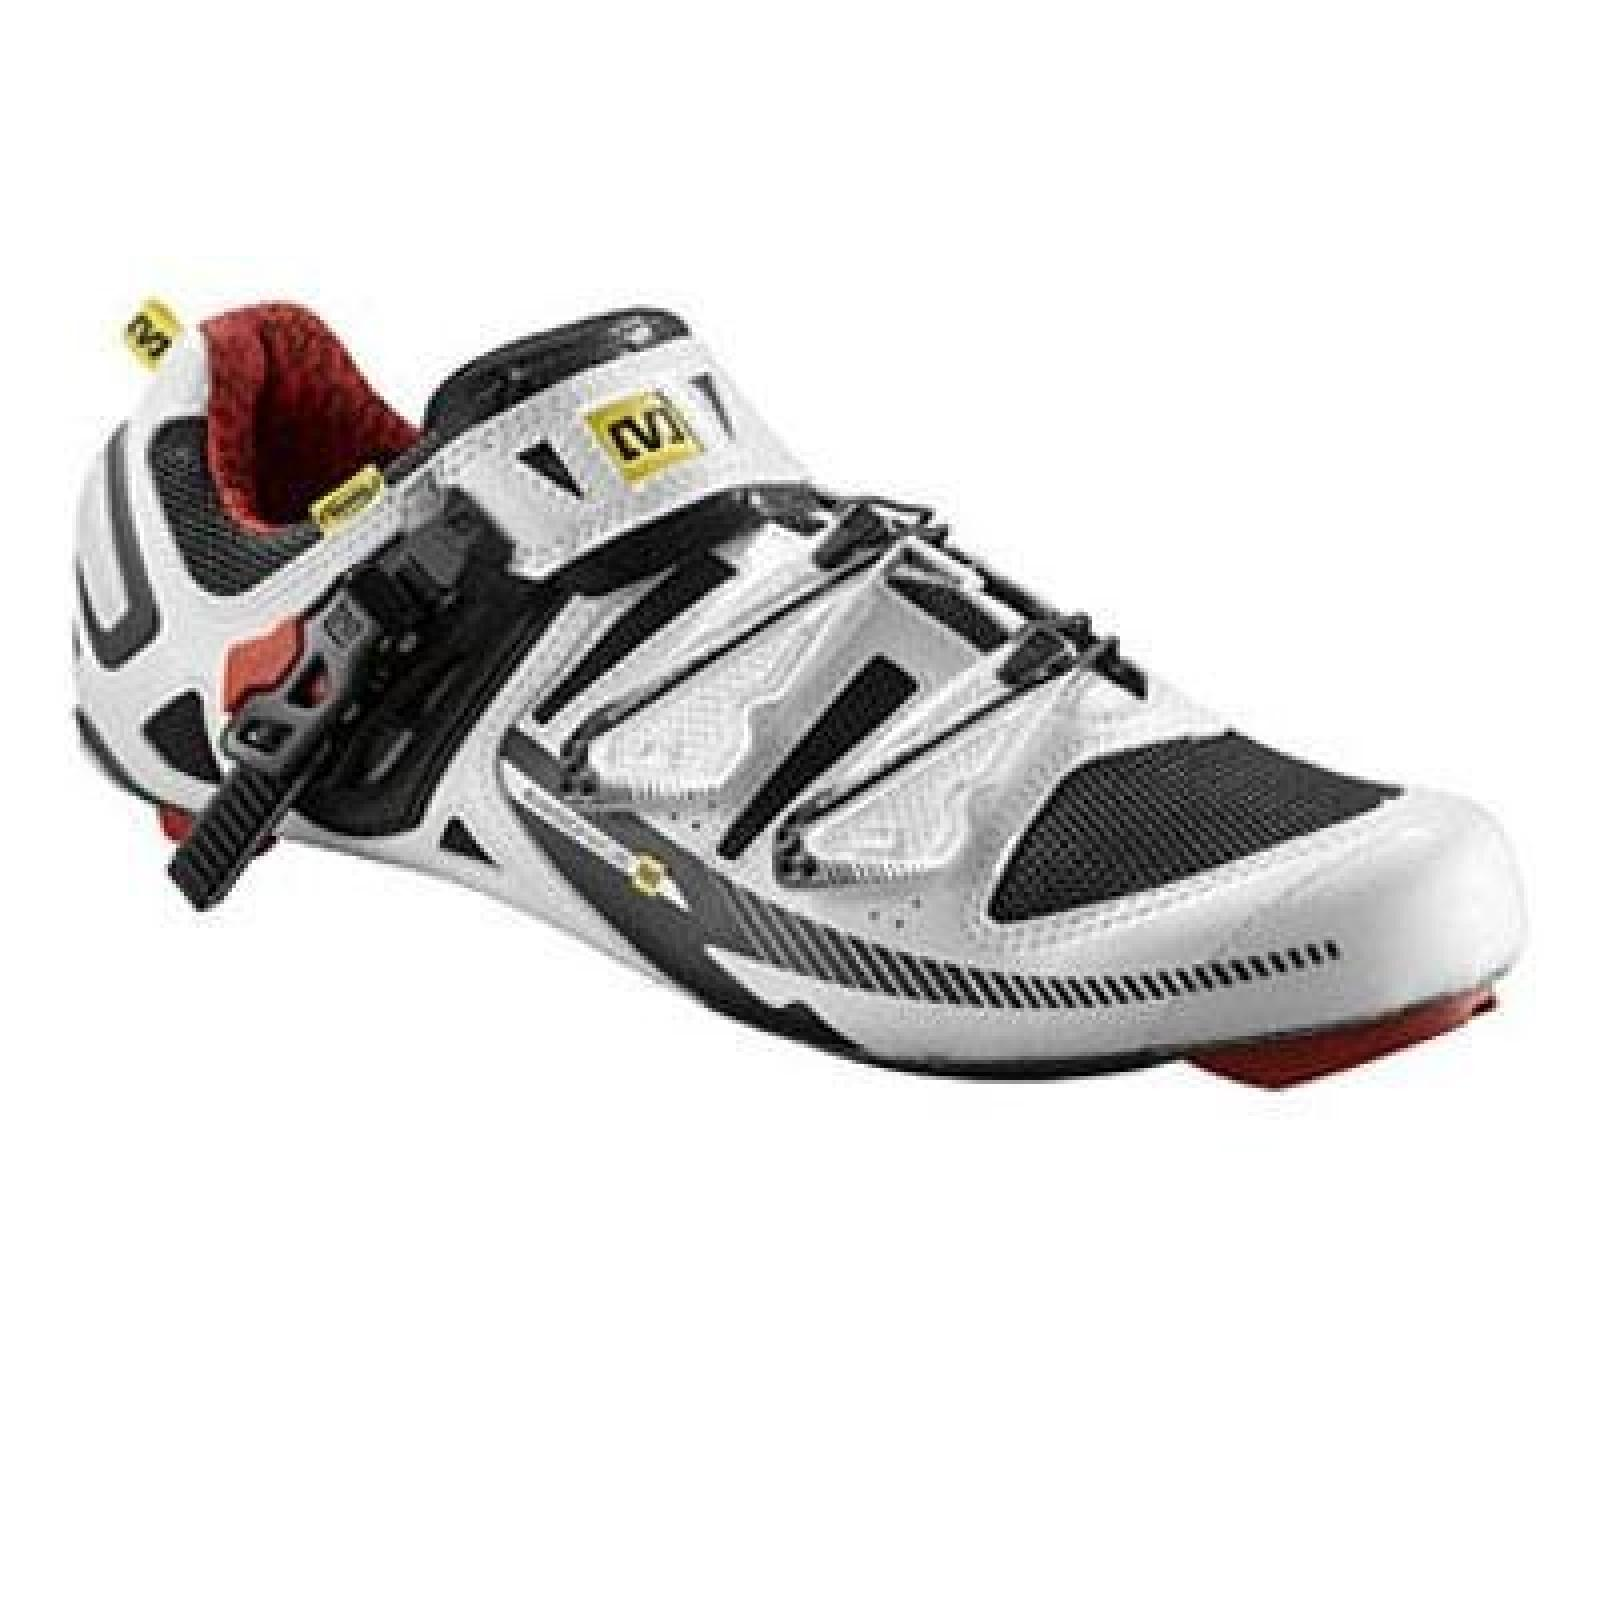 MAVIC Schuhe Unisex Pro Road